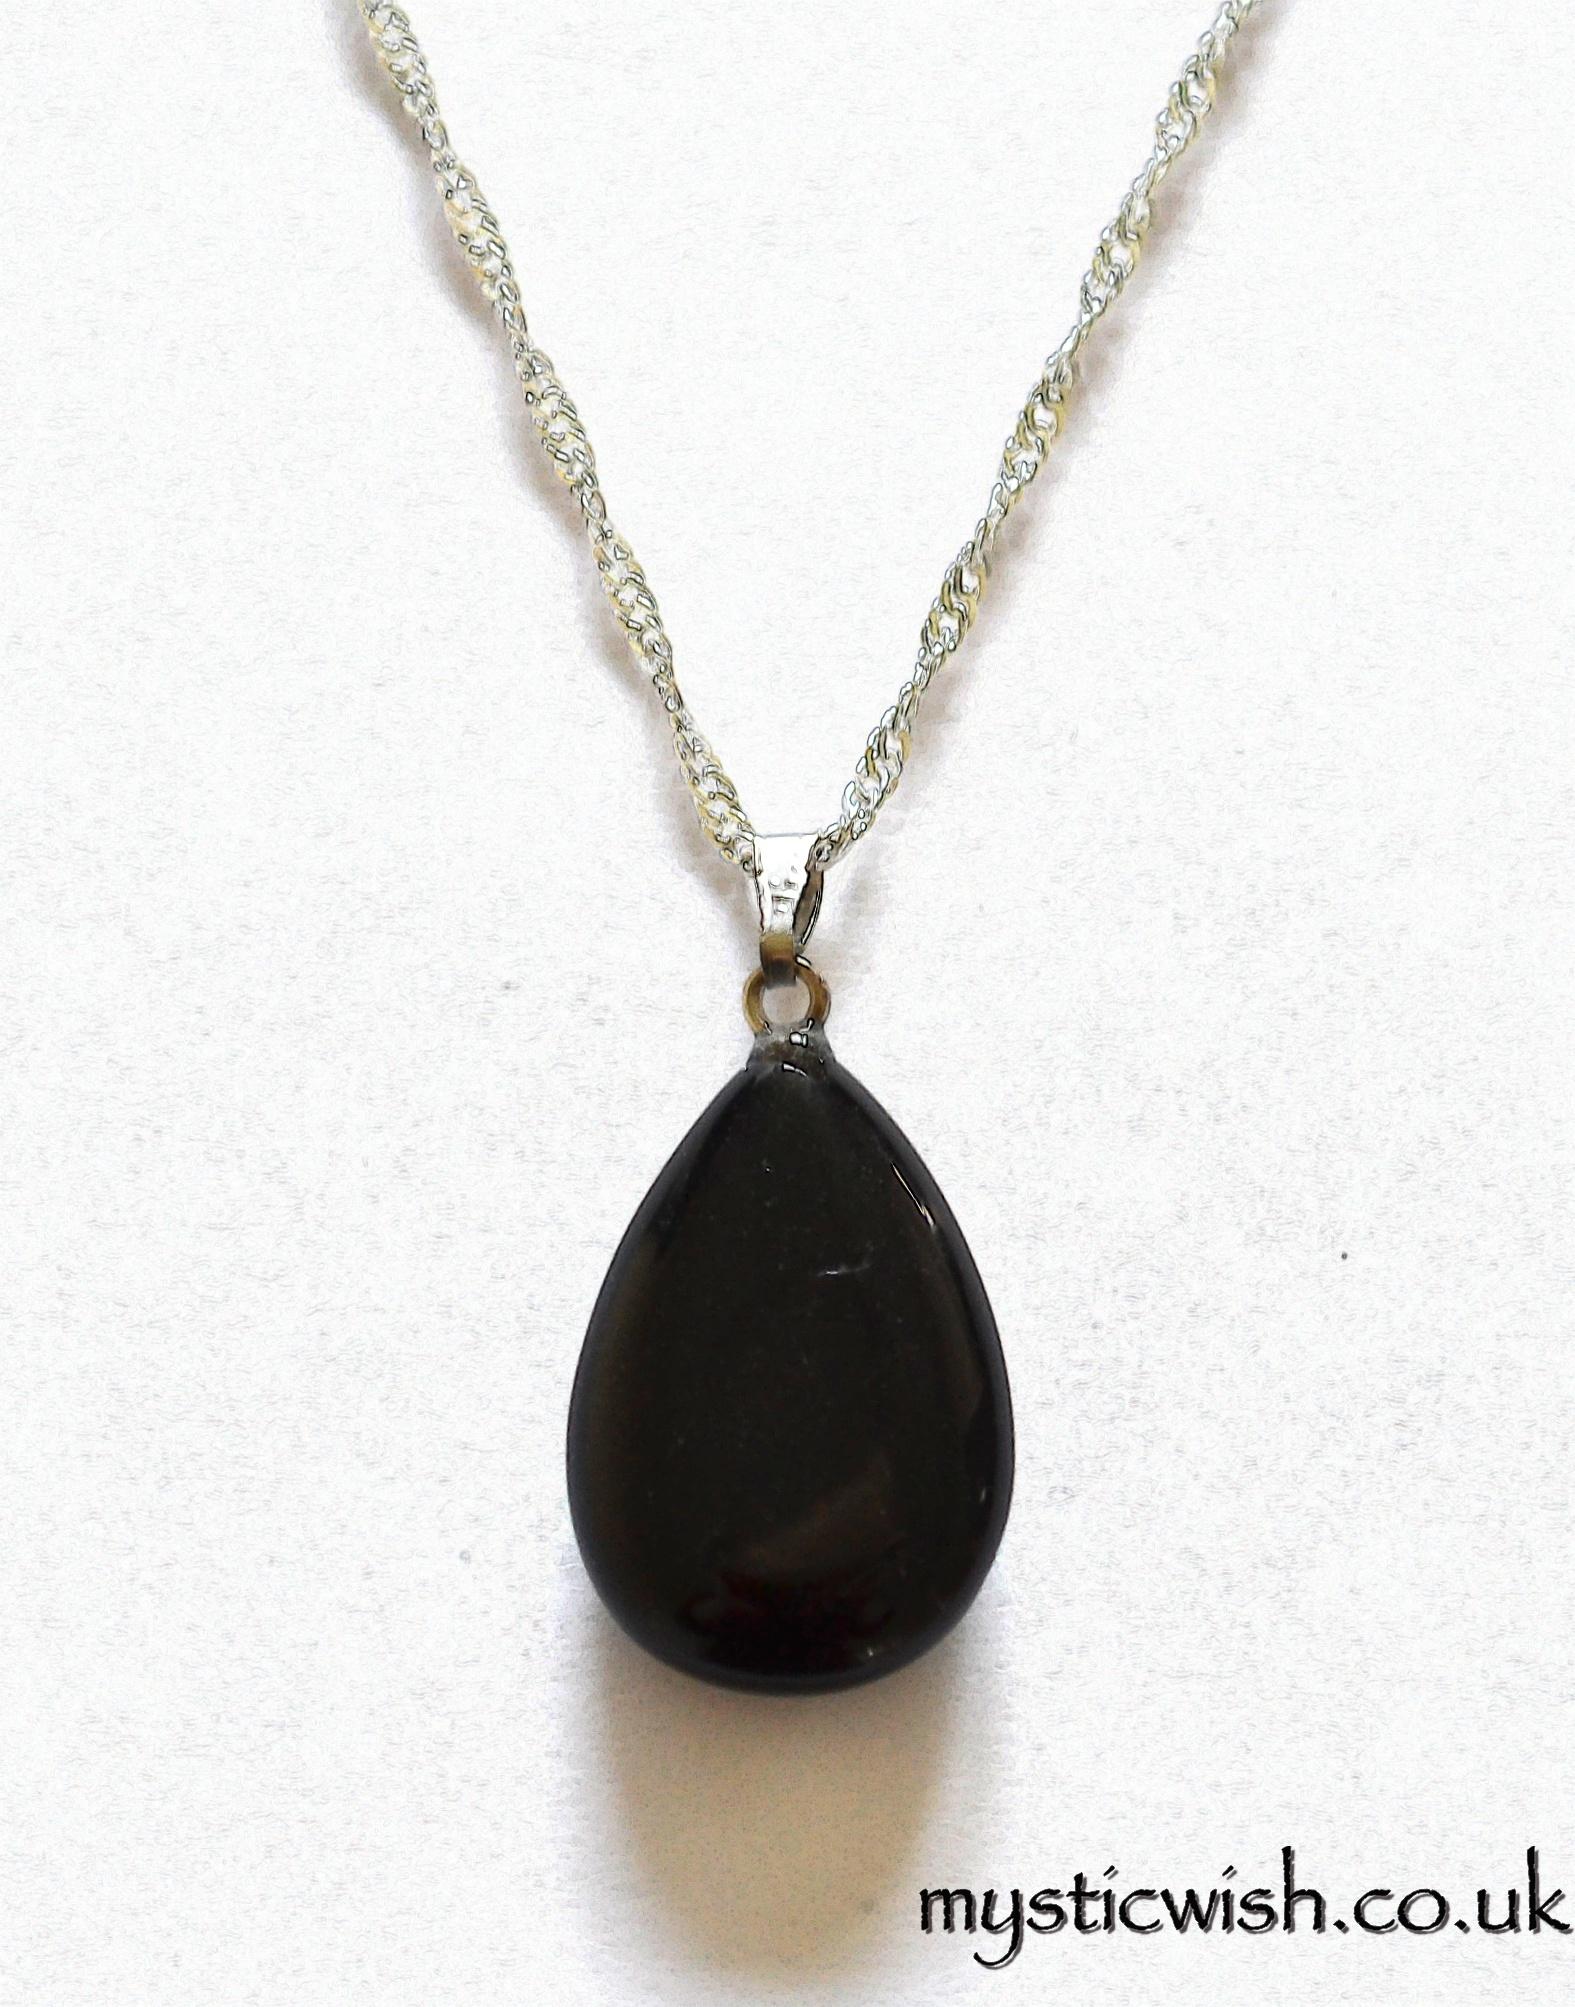 Black Obsidian Teardrop Pendant Necklace Negativity